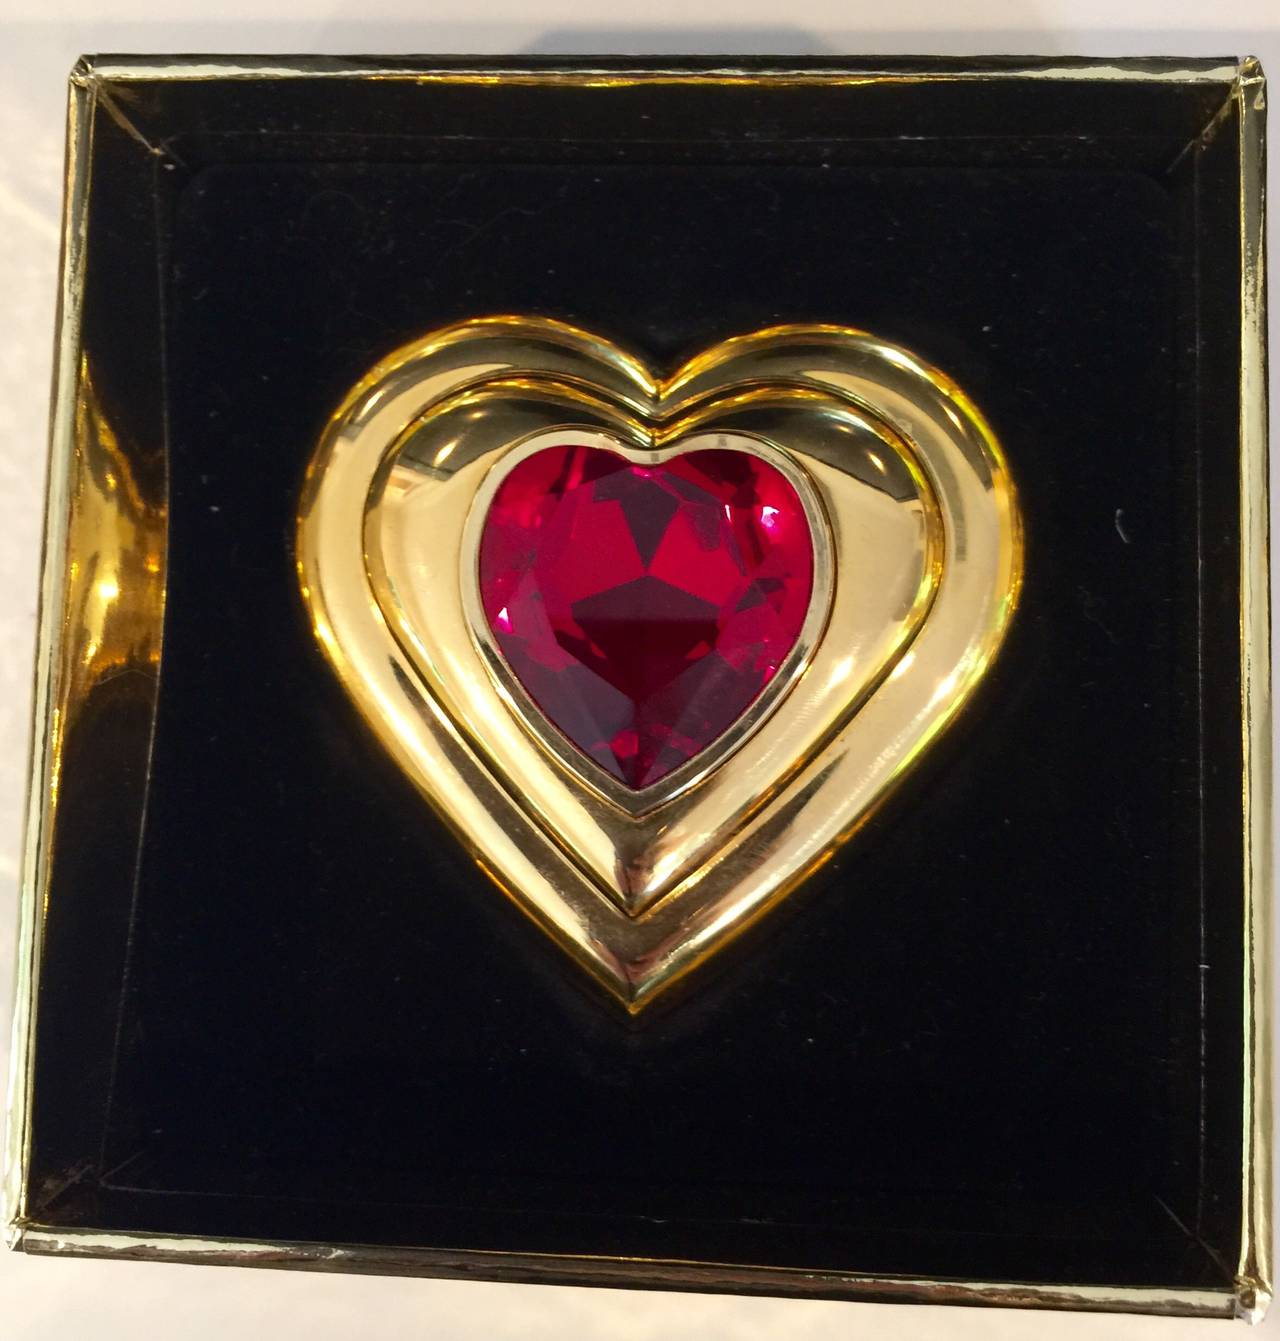 Yves Saint Laurent Paris Dazzling Ruby Crystal Jewel Heart